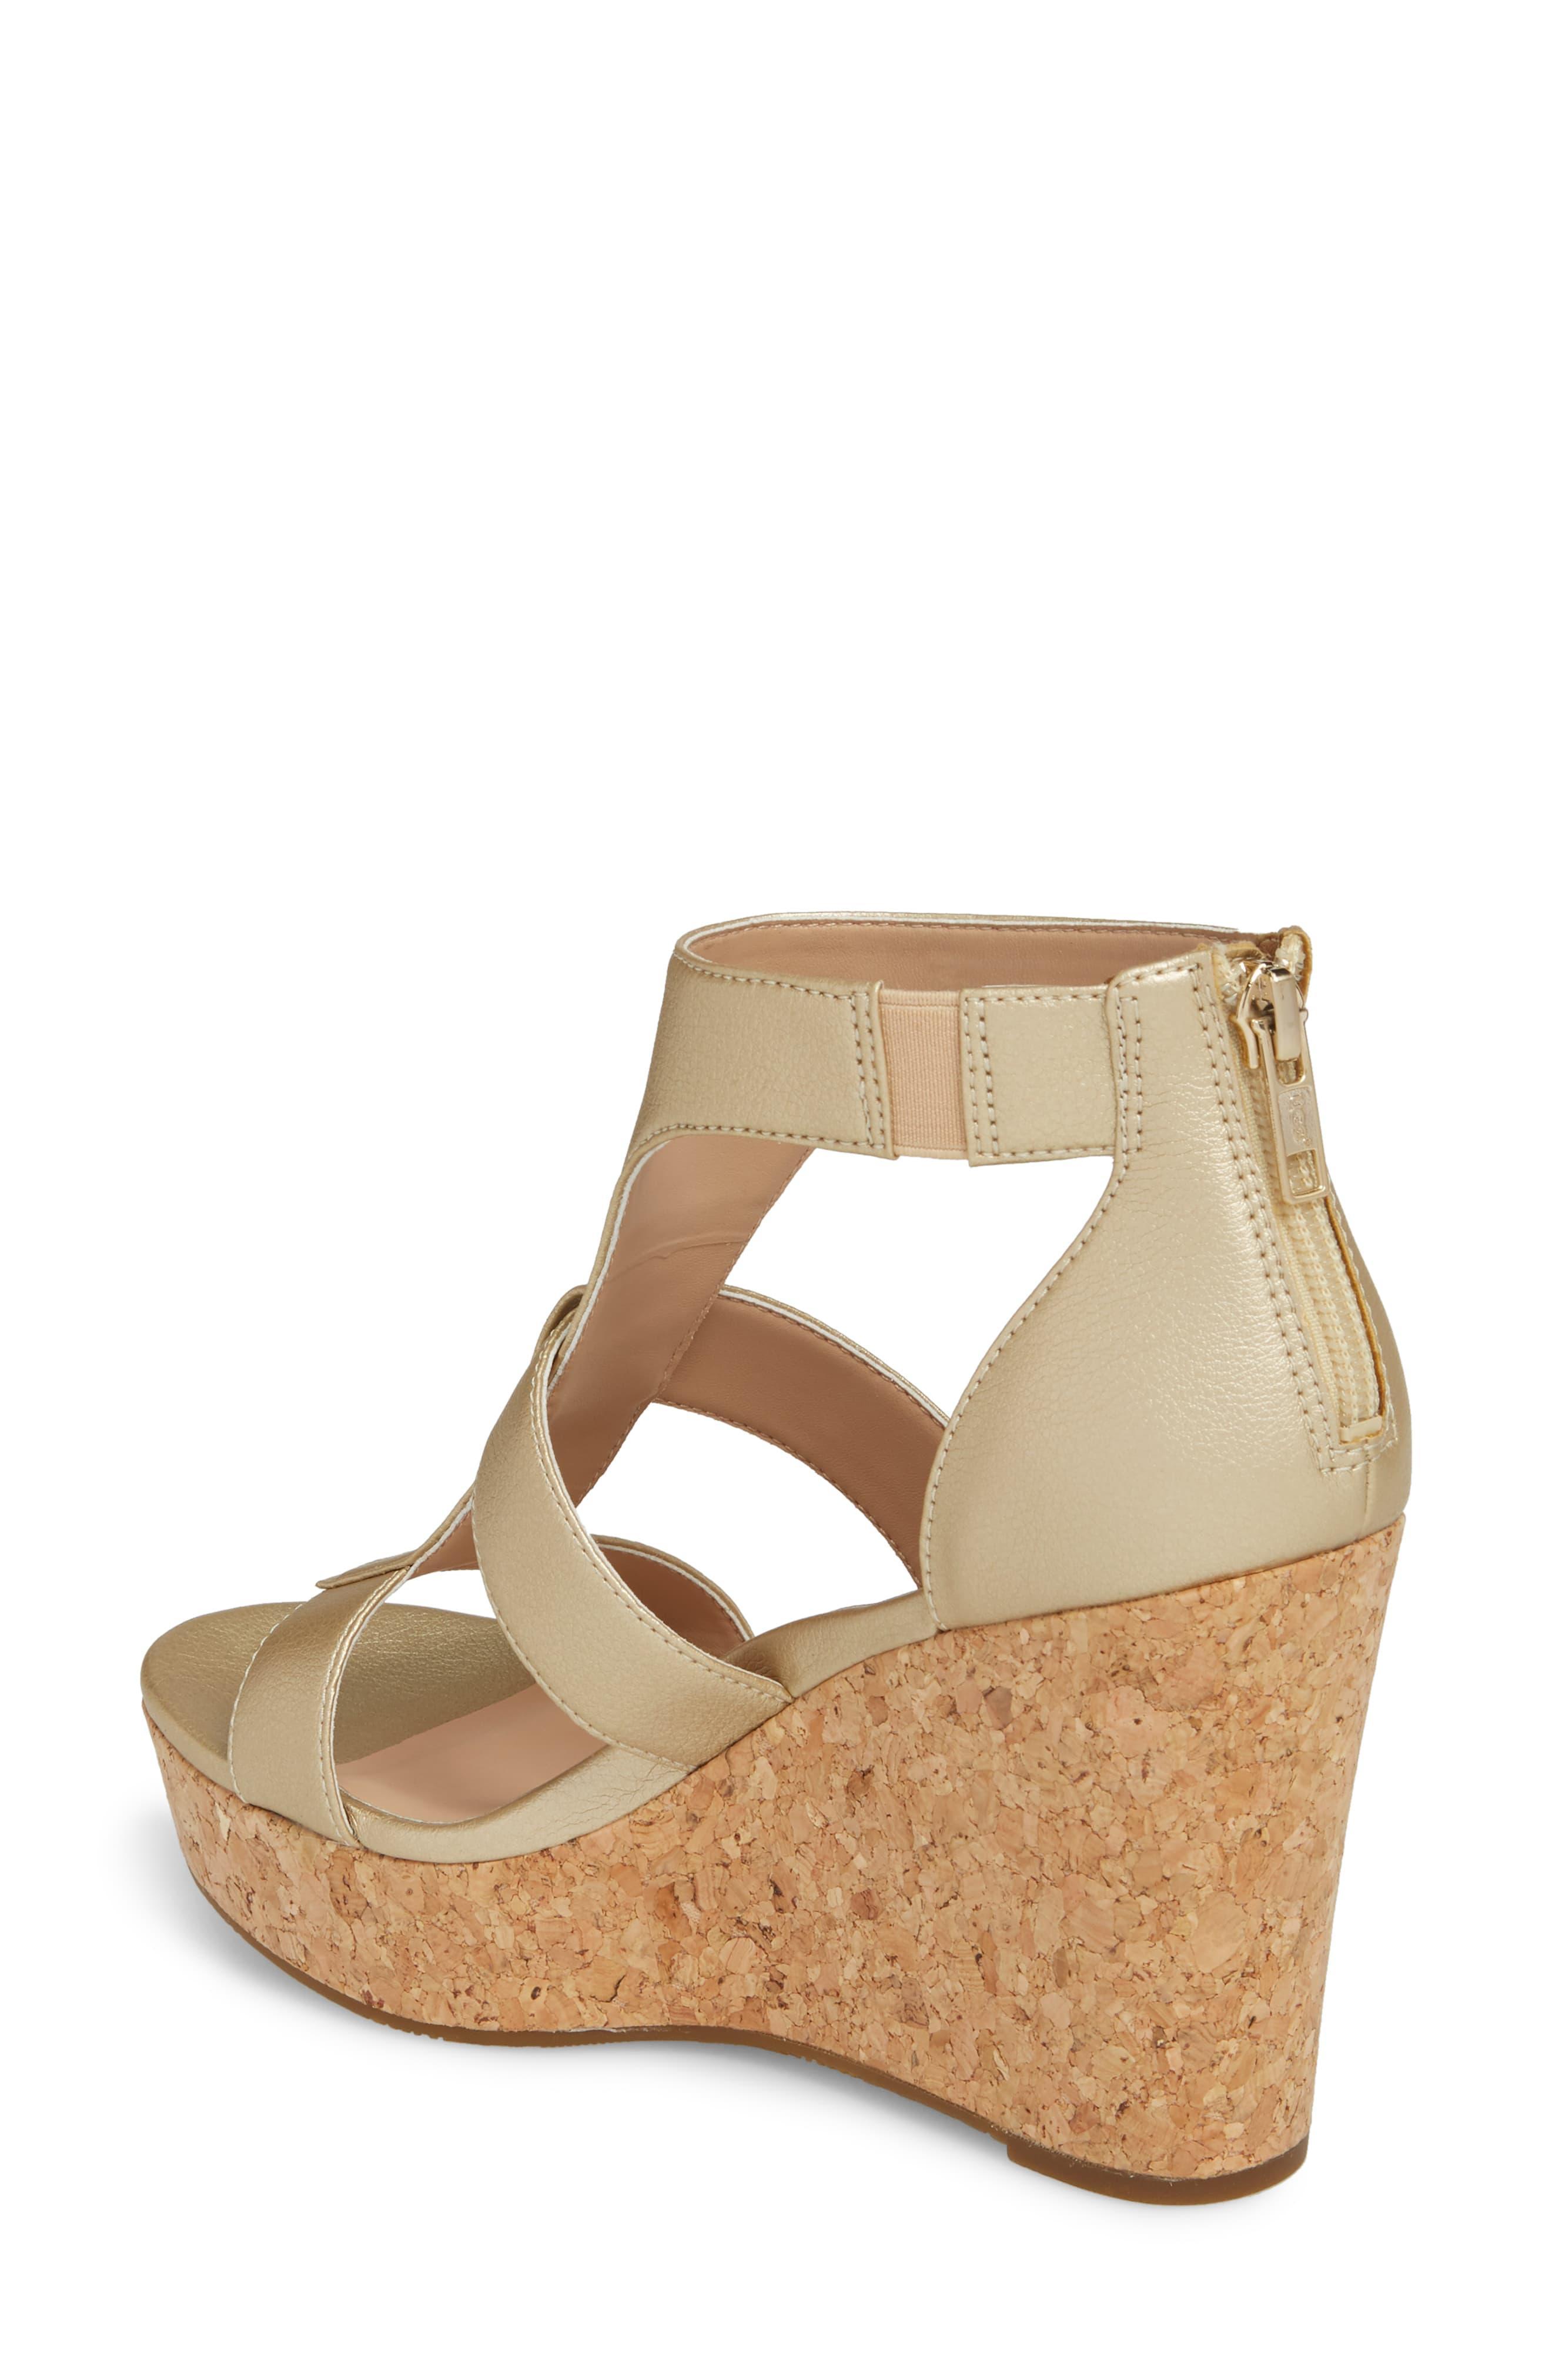 dd6beaf71e5 Women's Metallic Ugg Whitney Platform Wedge Sandal